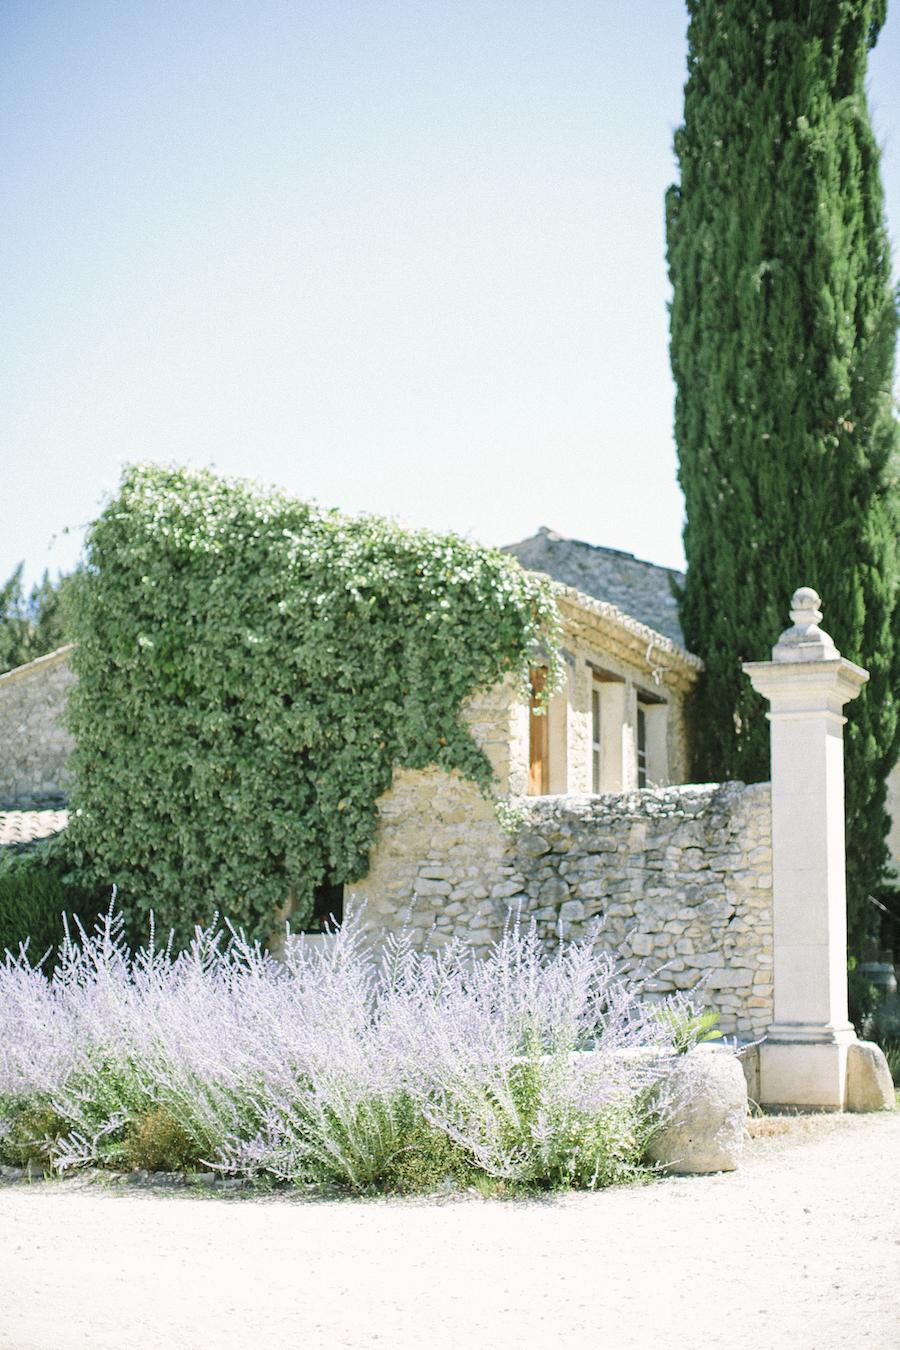 saya-photography-jewish-wedding-provence-rustic-lourmarin-le-galinier-3.jpg